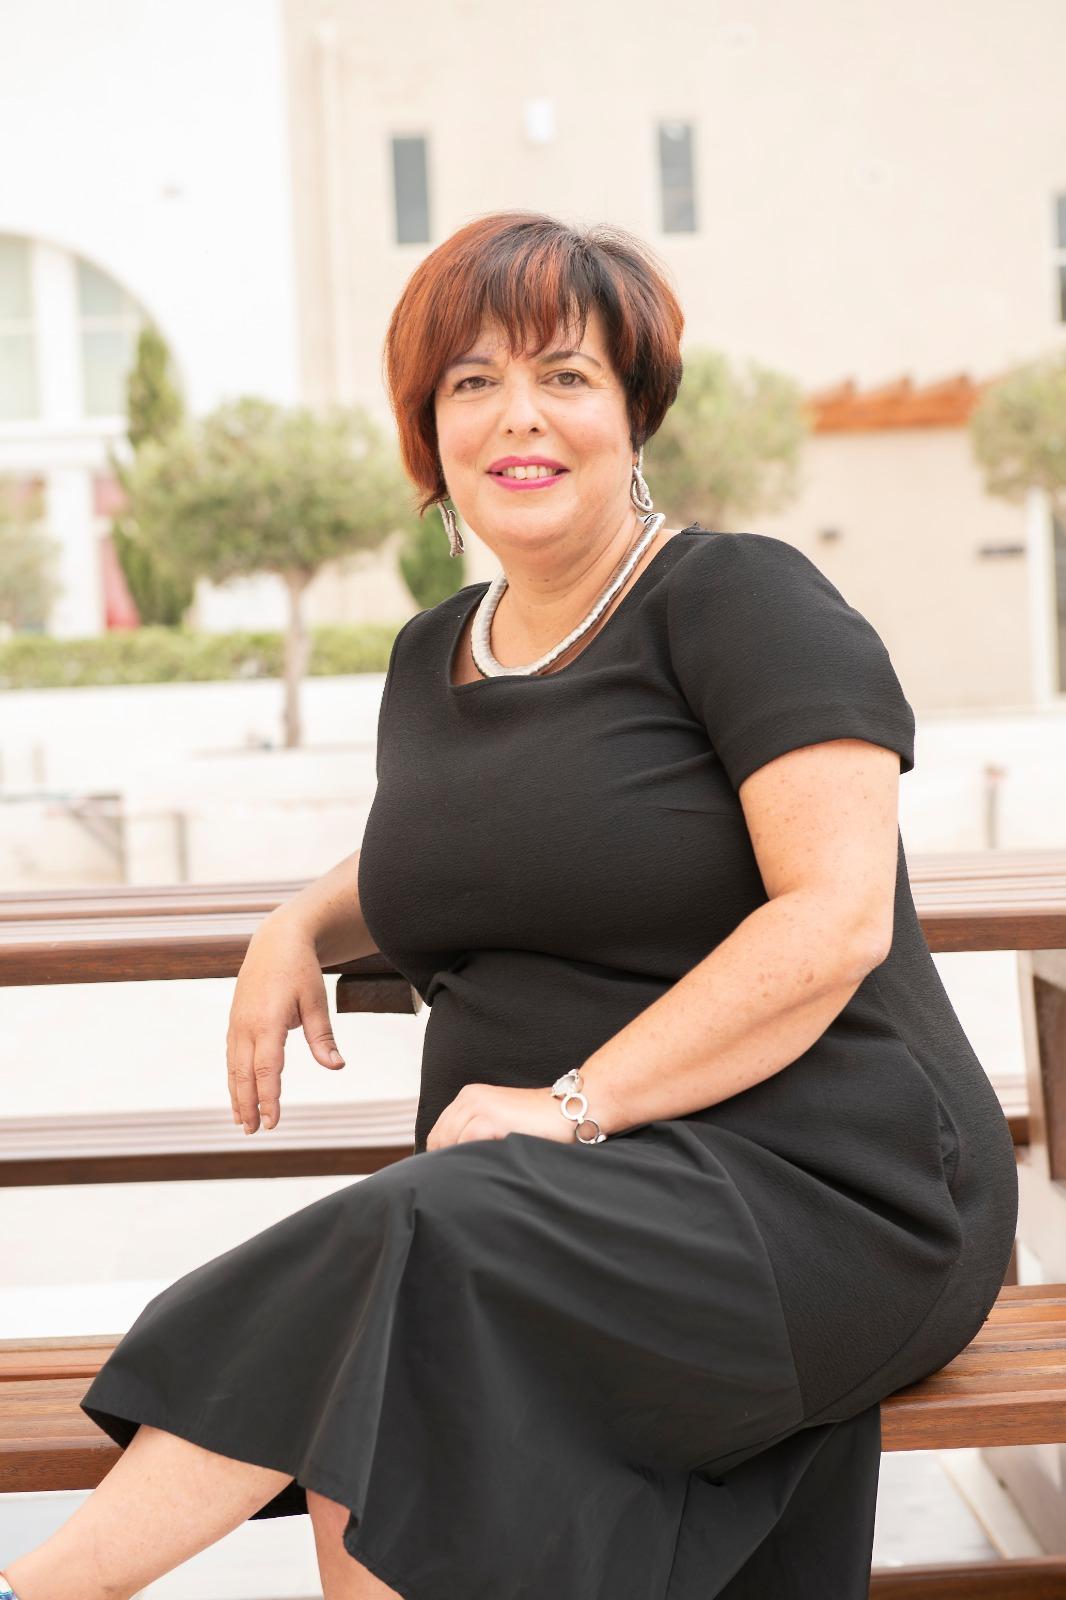 Miriam Teuma